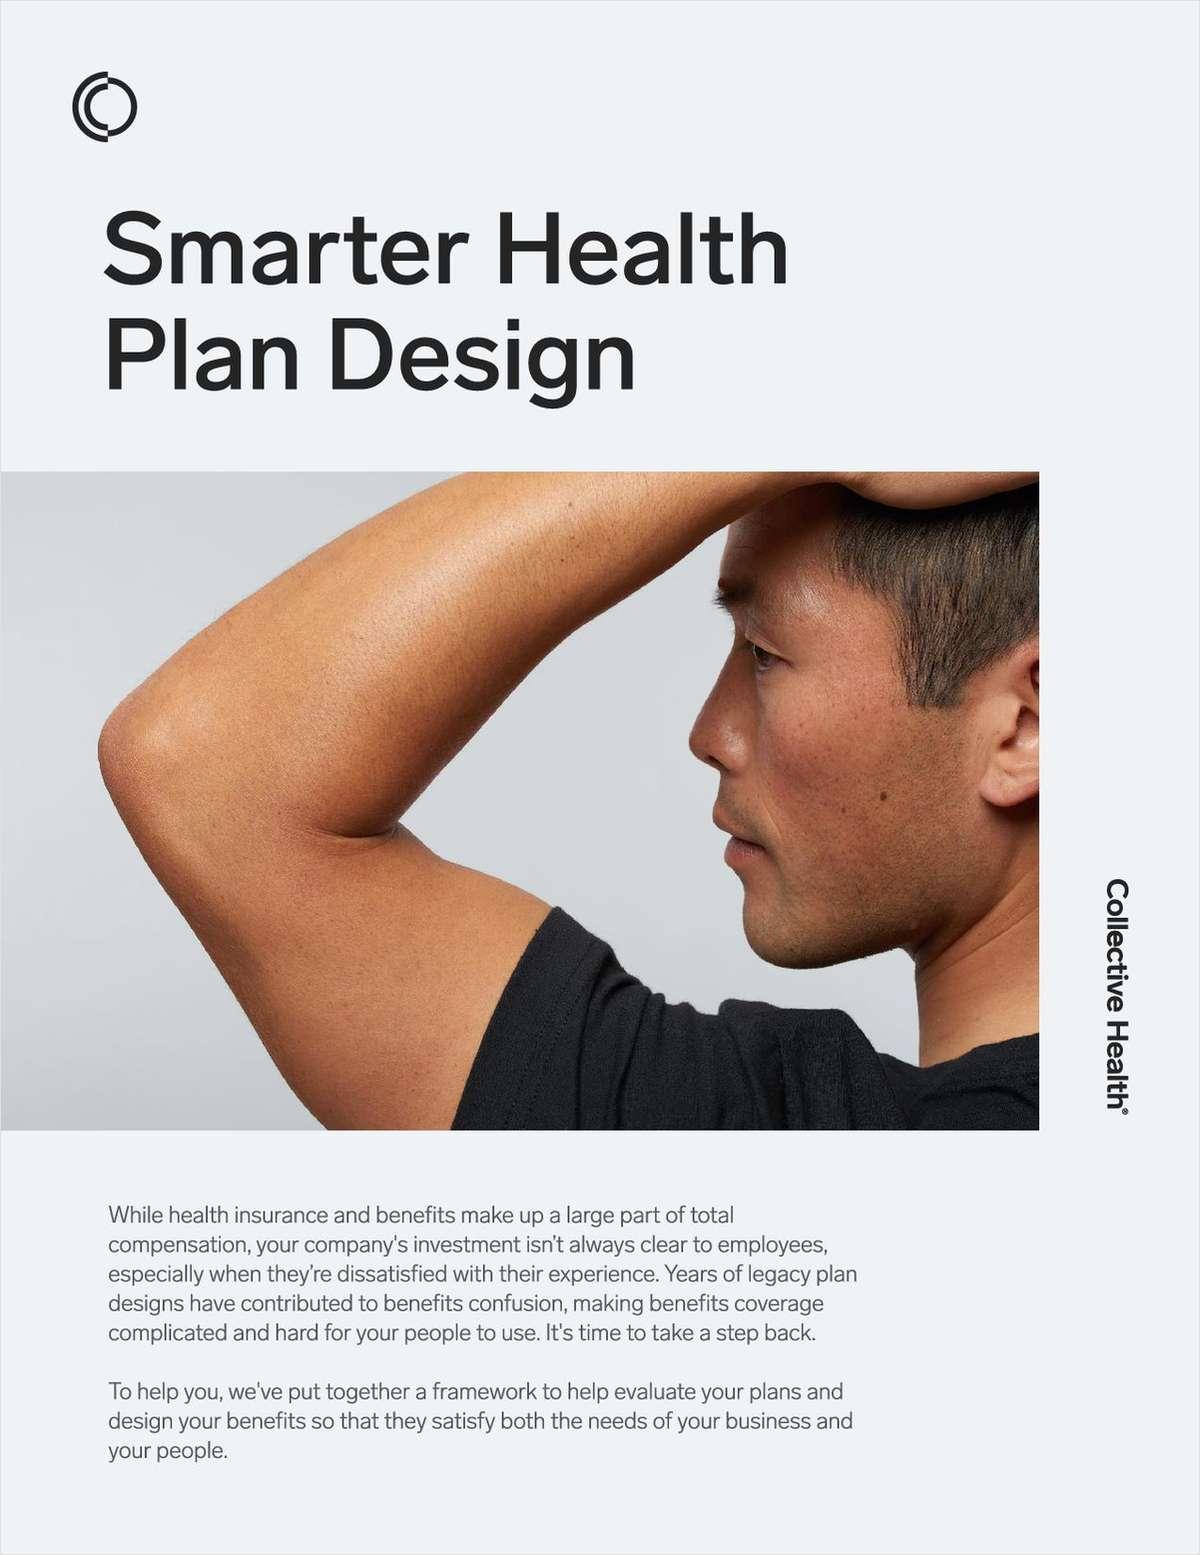 Guide to Smarter Health Plan Design